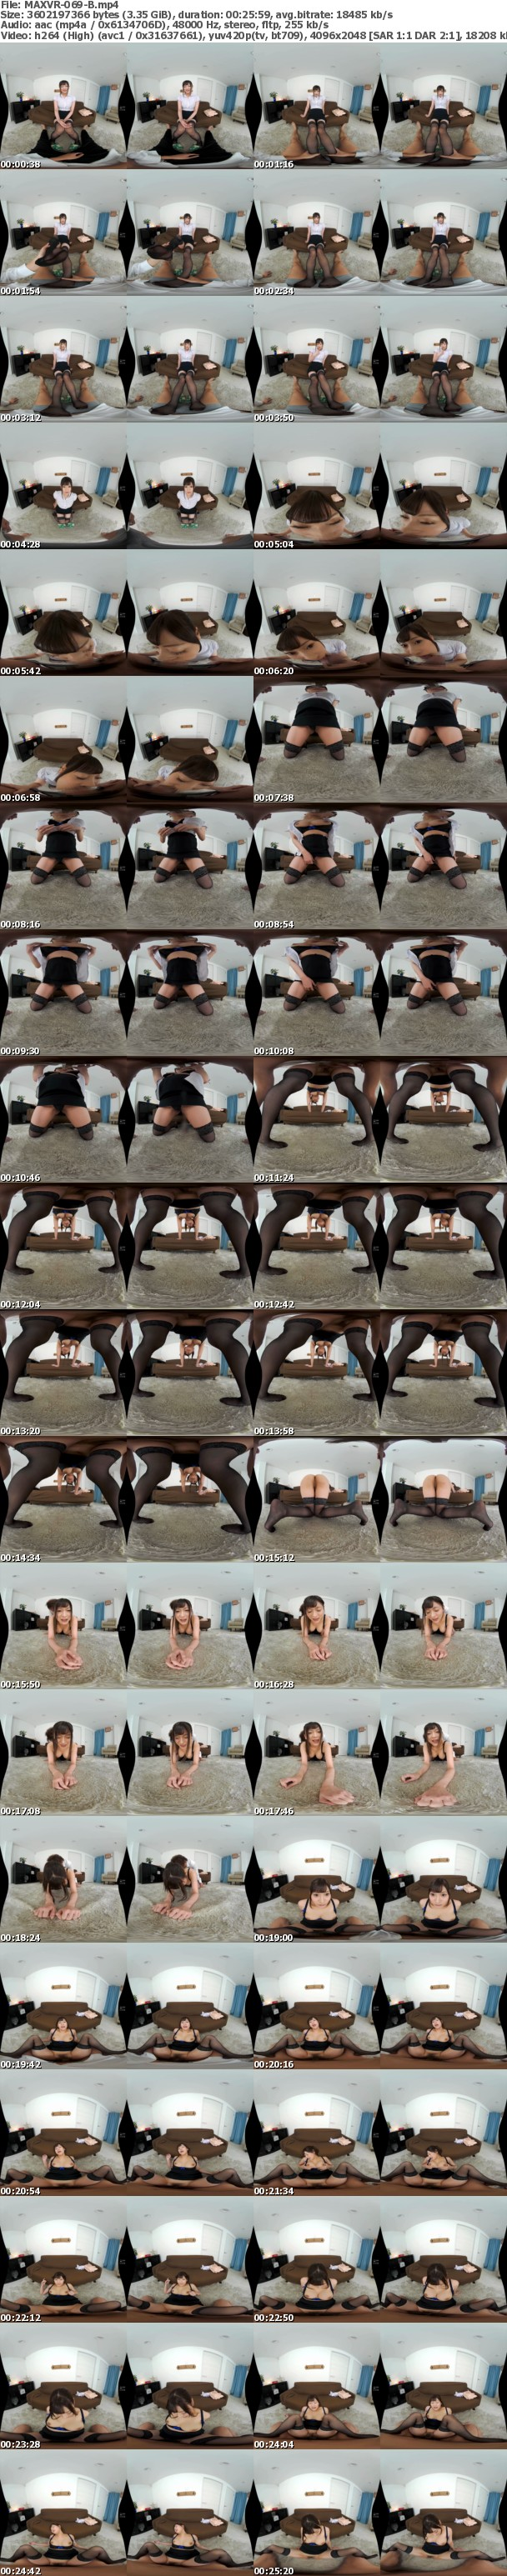 (VR) MAXVR-069 初めてのAV面接!何も知らない主婦を体の隅々までチェックしてフェラテスト、オナニーテストしたら感度が良すぎてその日のうちに暴走ハメ撮り!~面接から即撮影!AV監督になれるVR~ 泉ゆうめ